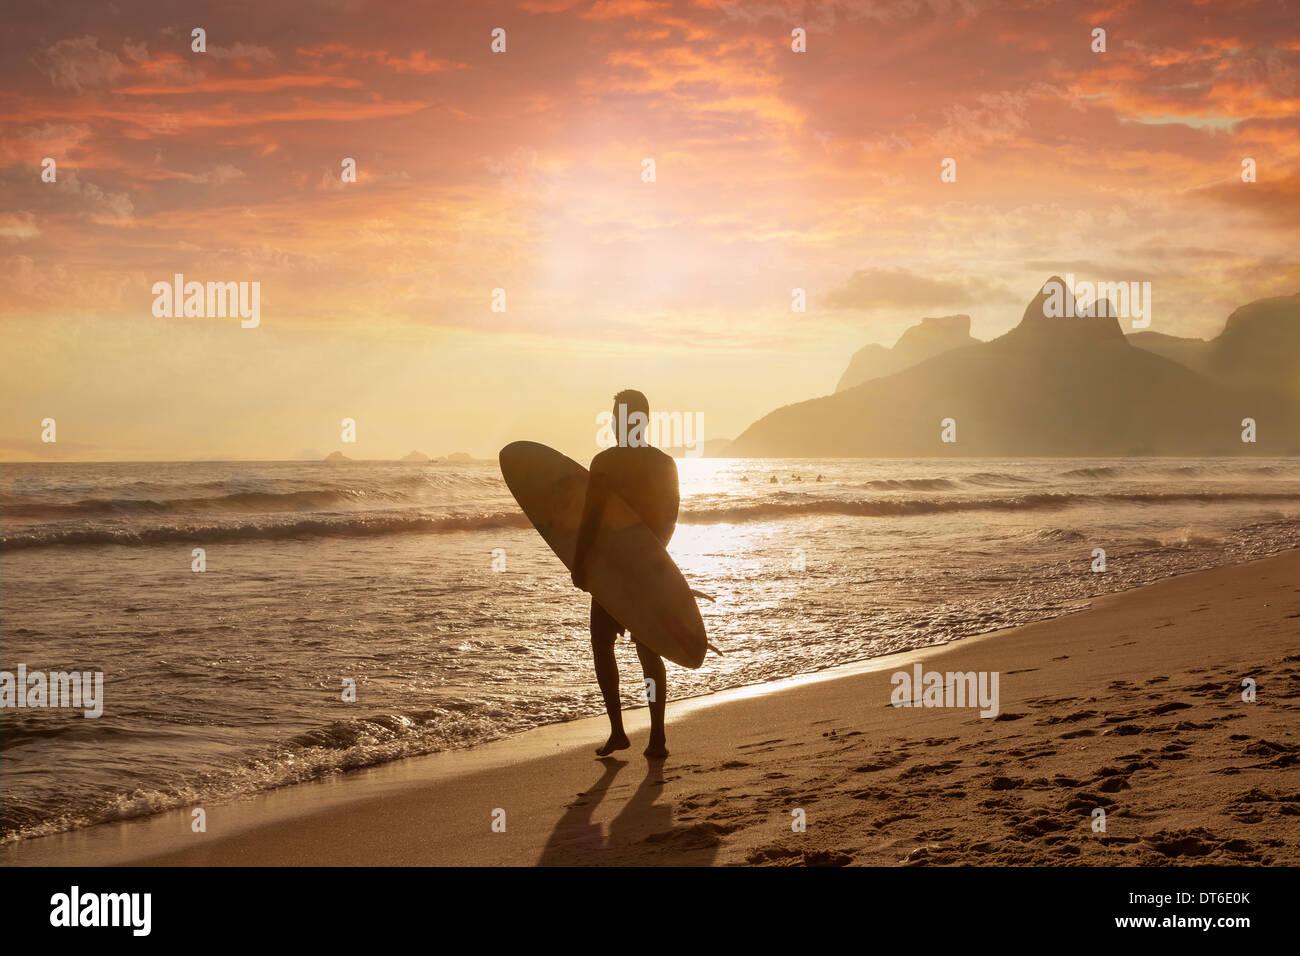 Young man carrying surfboard on Ipanema beach, Rio De Janeiro, Brazil - Stock Image